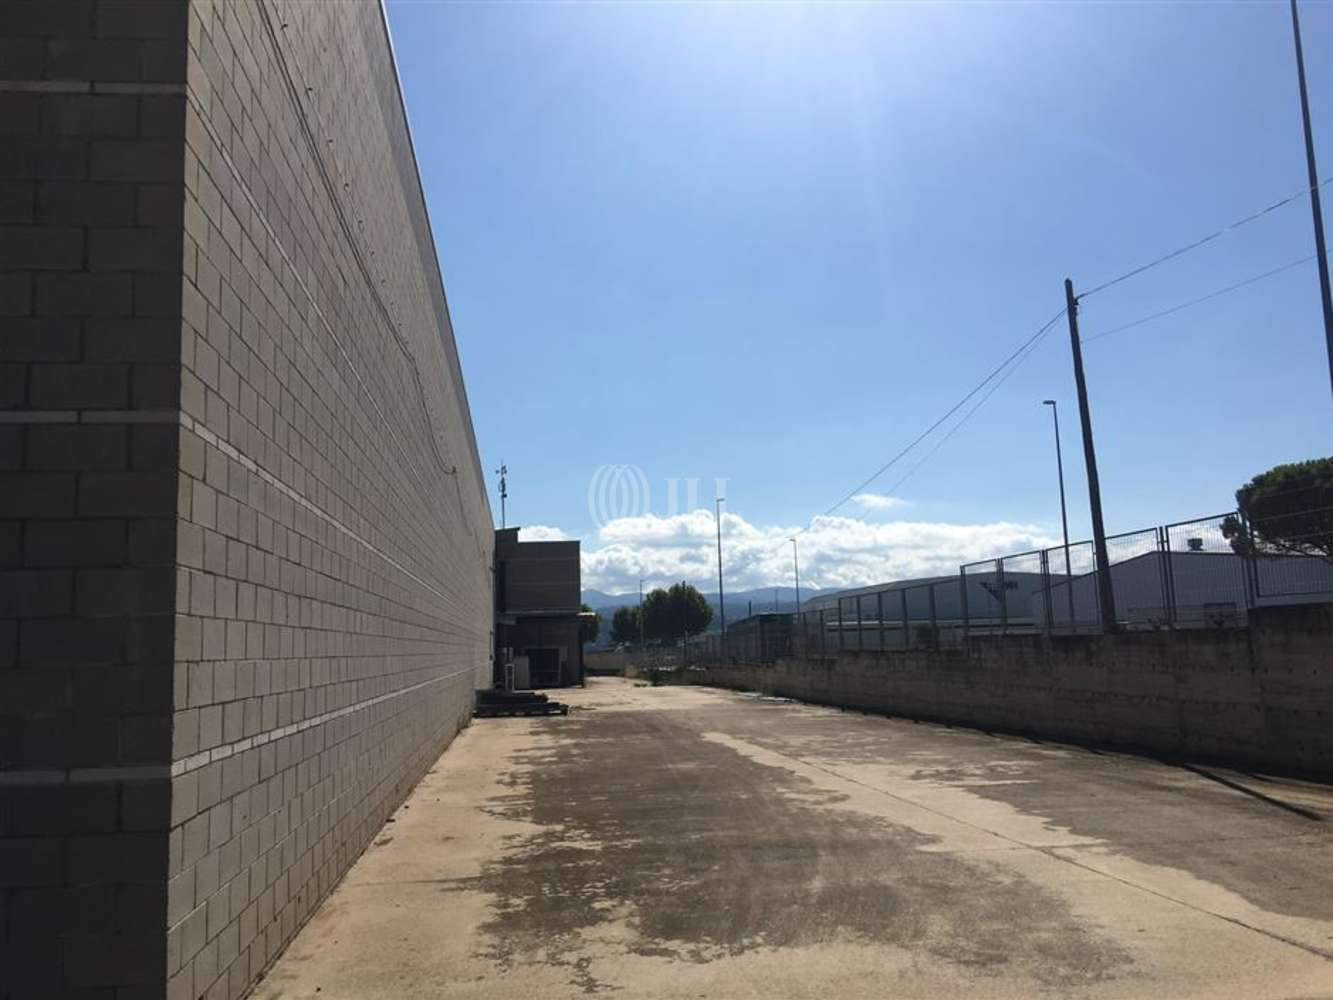 Naves industriales y logísticas Sant fruitós de bages, 08272 - Nave Logistica - B0425 - PI SANT ISIDRE